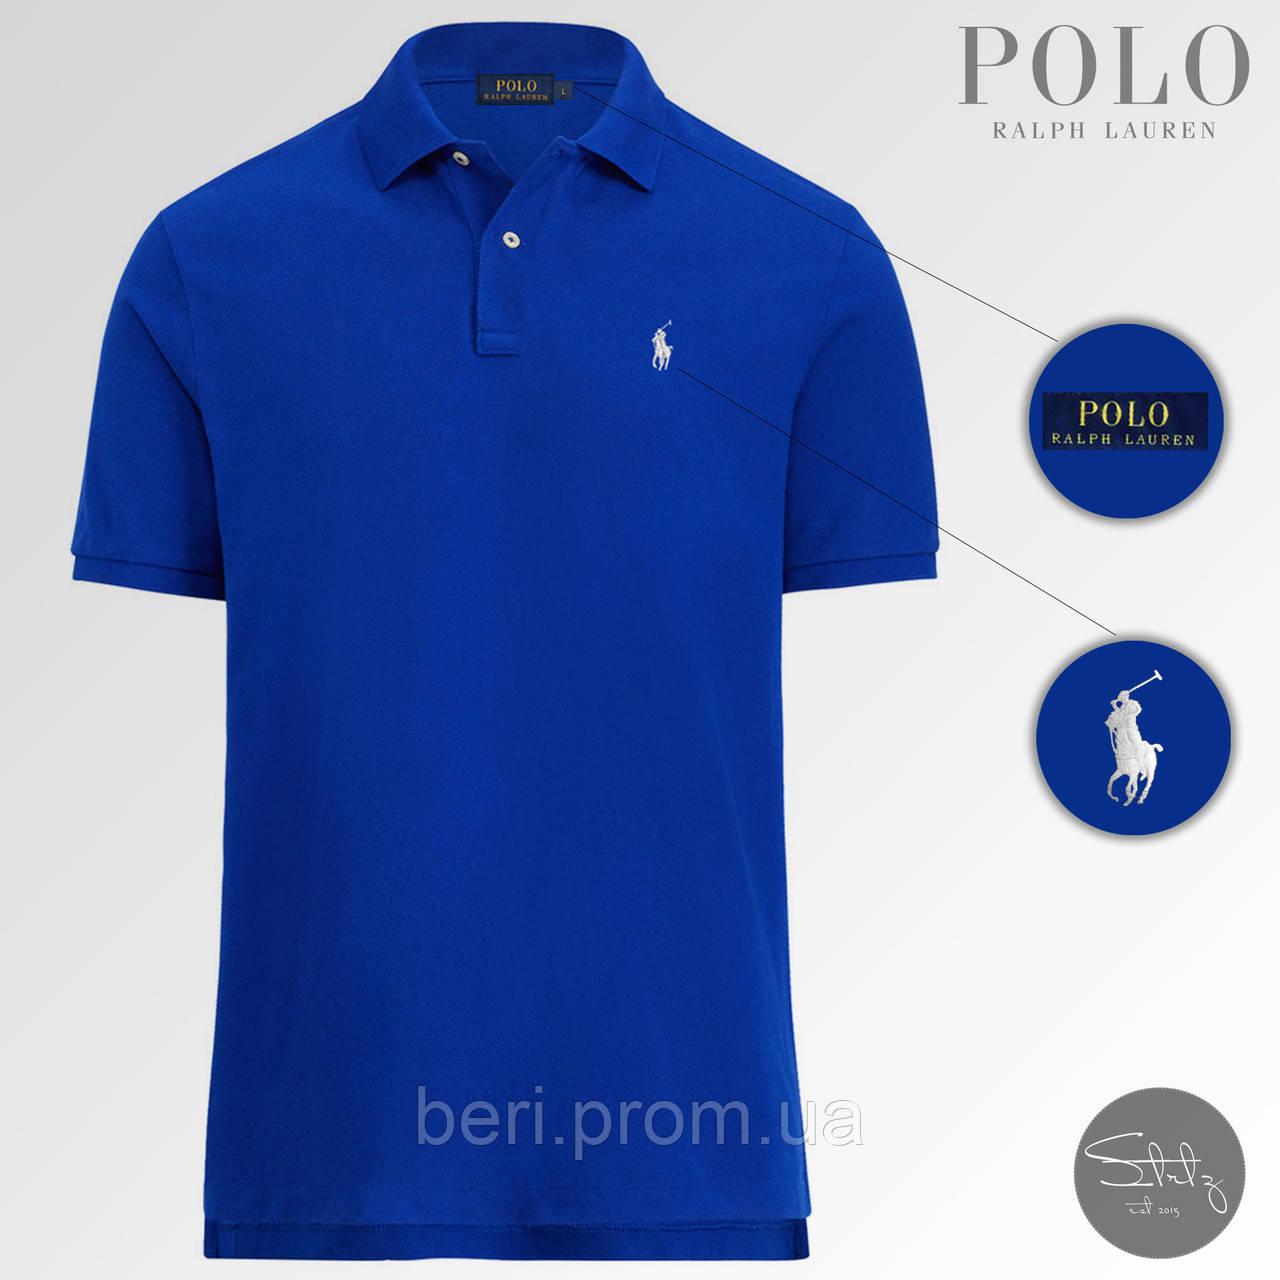 Мужская футболка тениска поло Ralph Polo Lauren | Чоловіча теніска поло Ральф Поло Лорен (Синий)